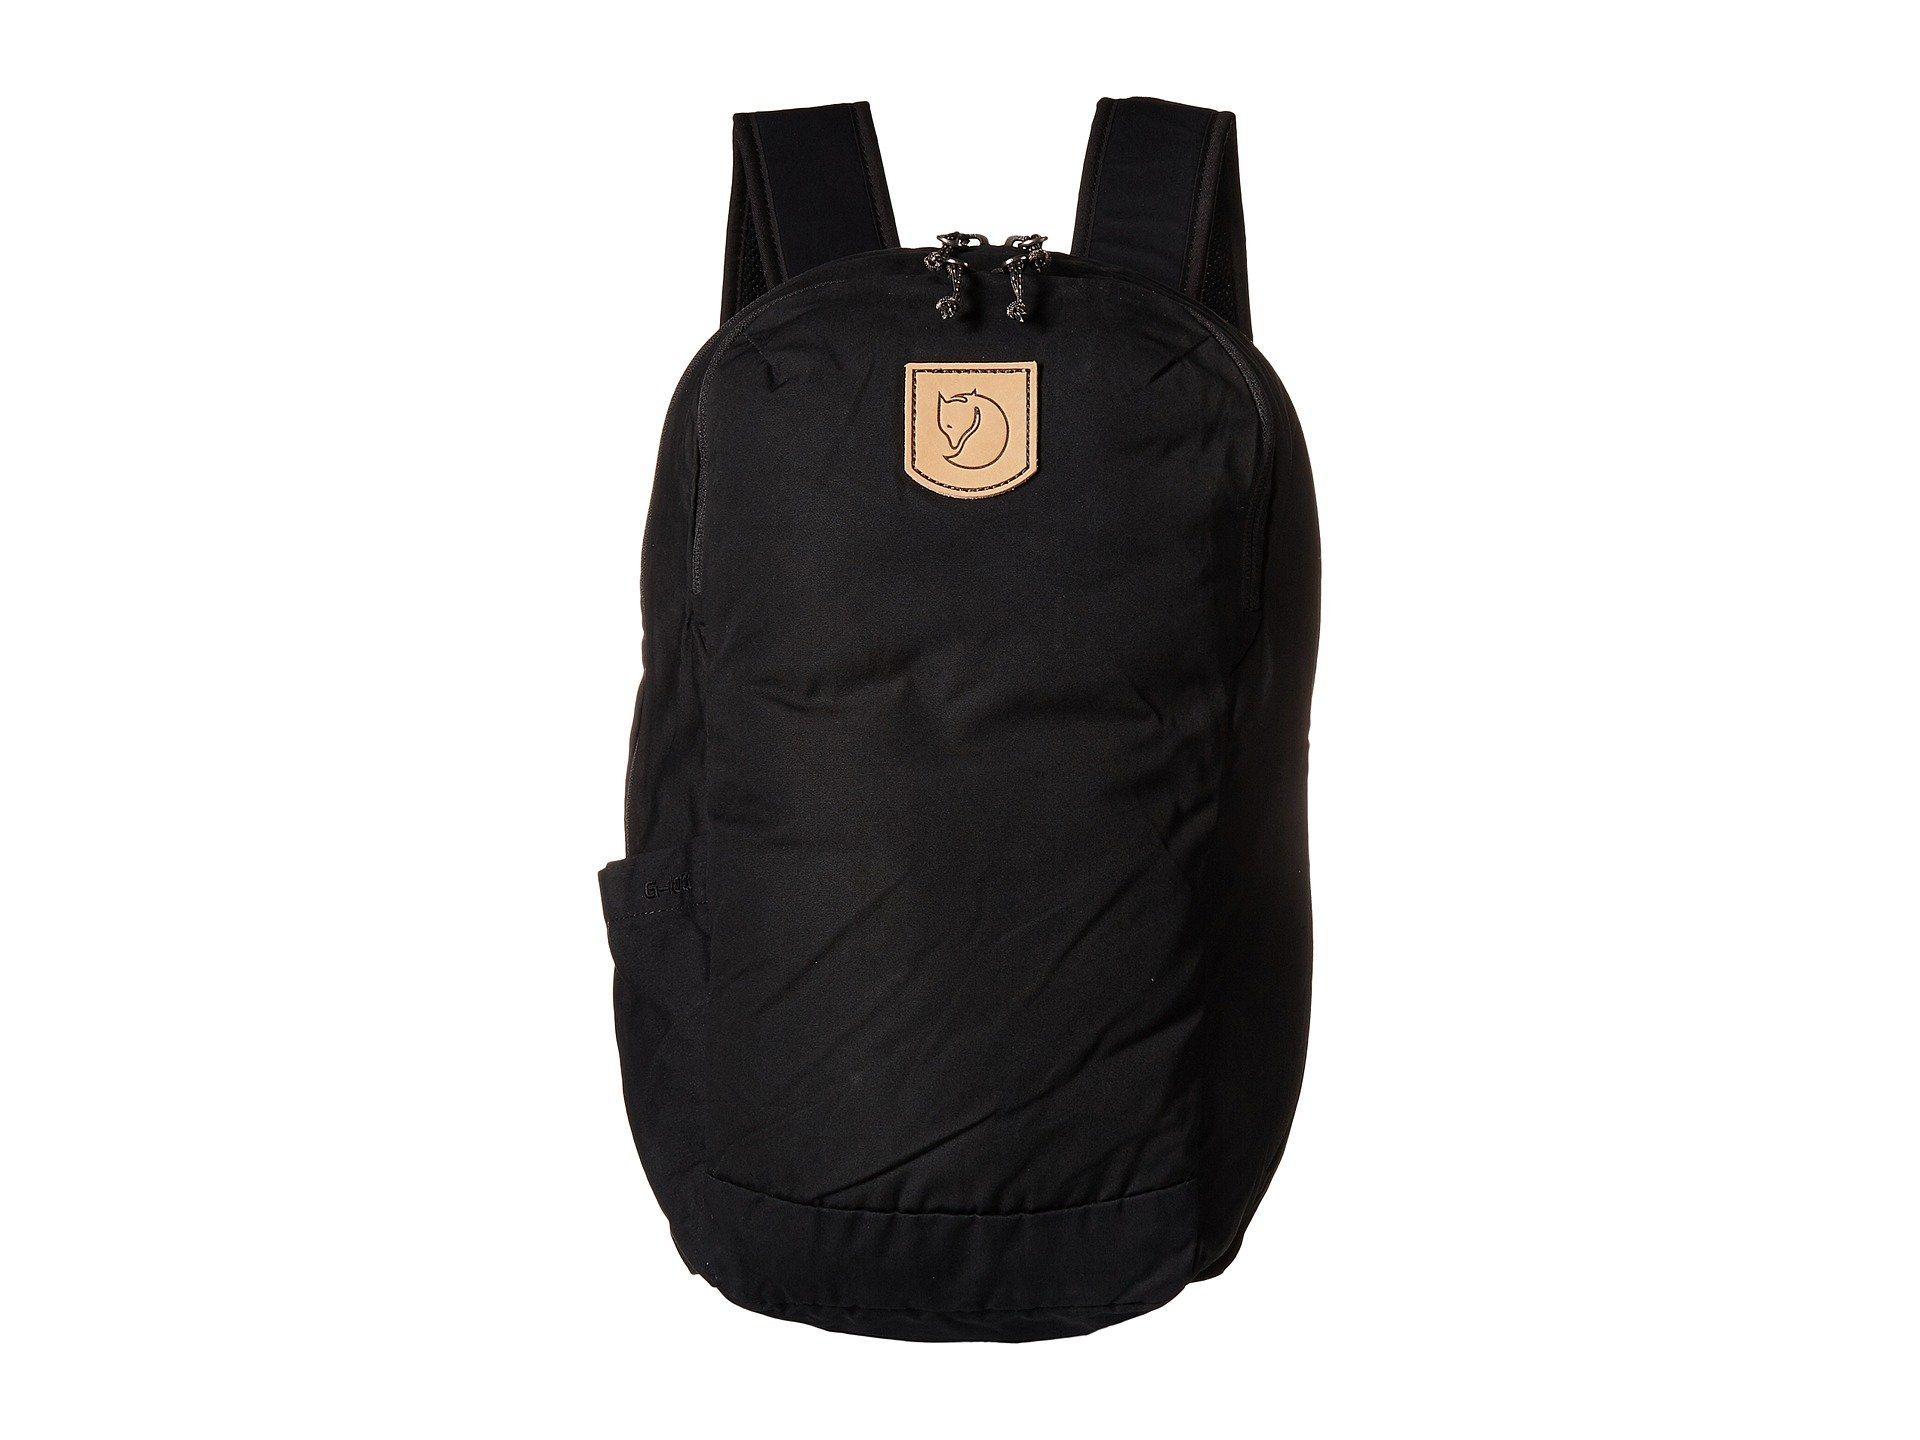 e3ae8f0fb2fd Michael Kors Women's Jet Set Item Monogram Logo Small Cross Body Bag ...